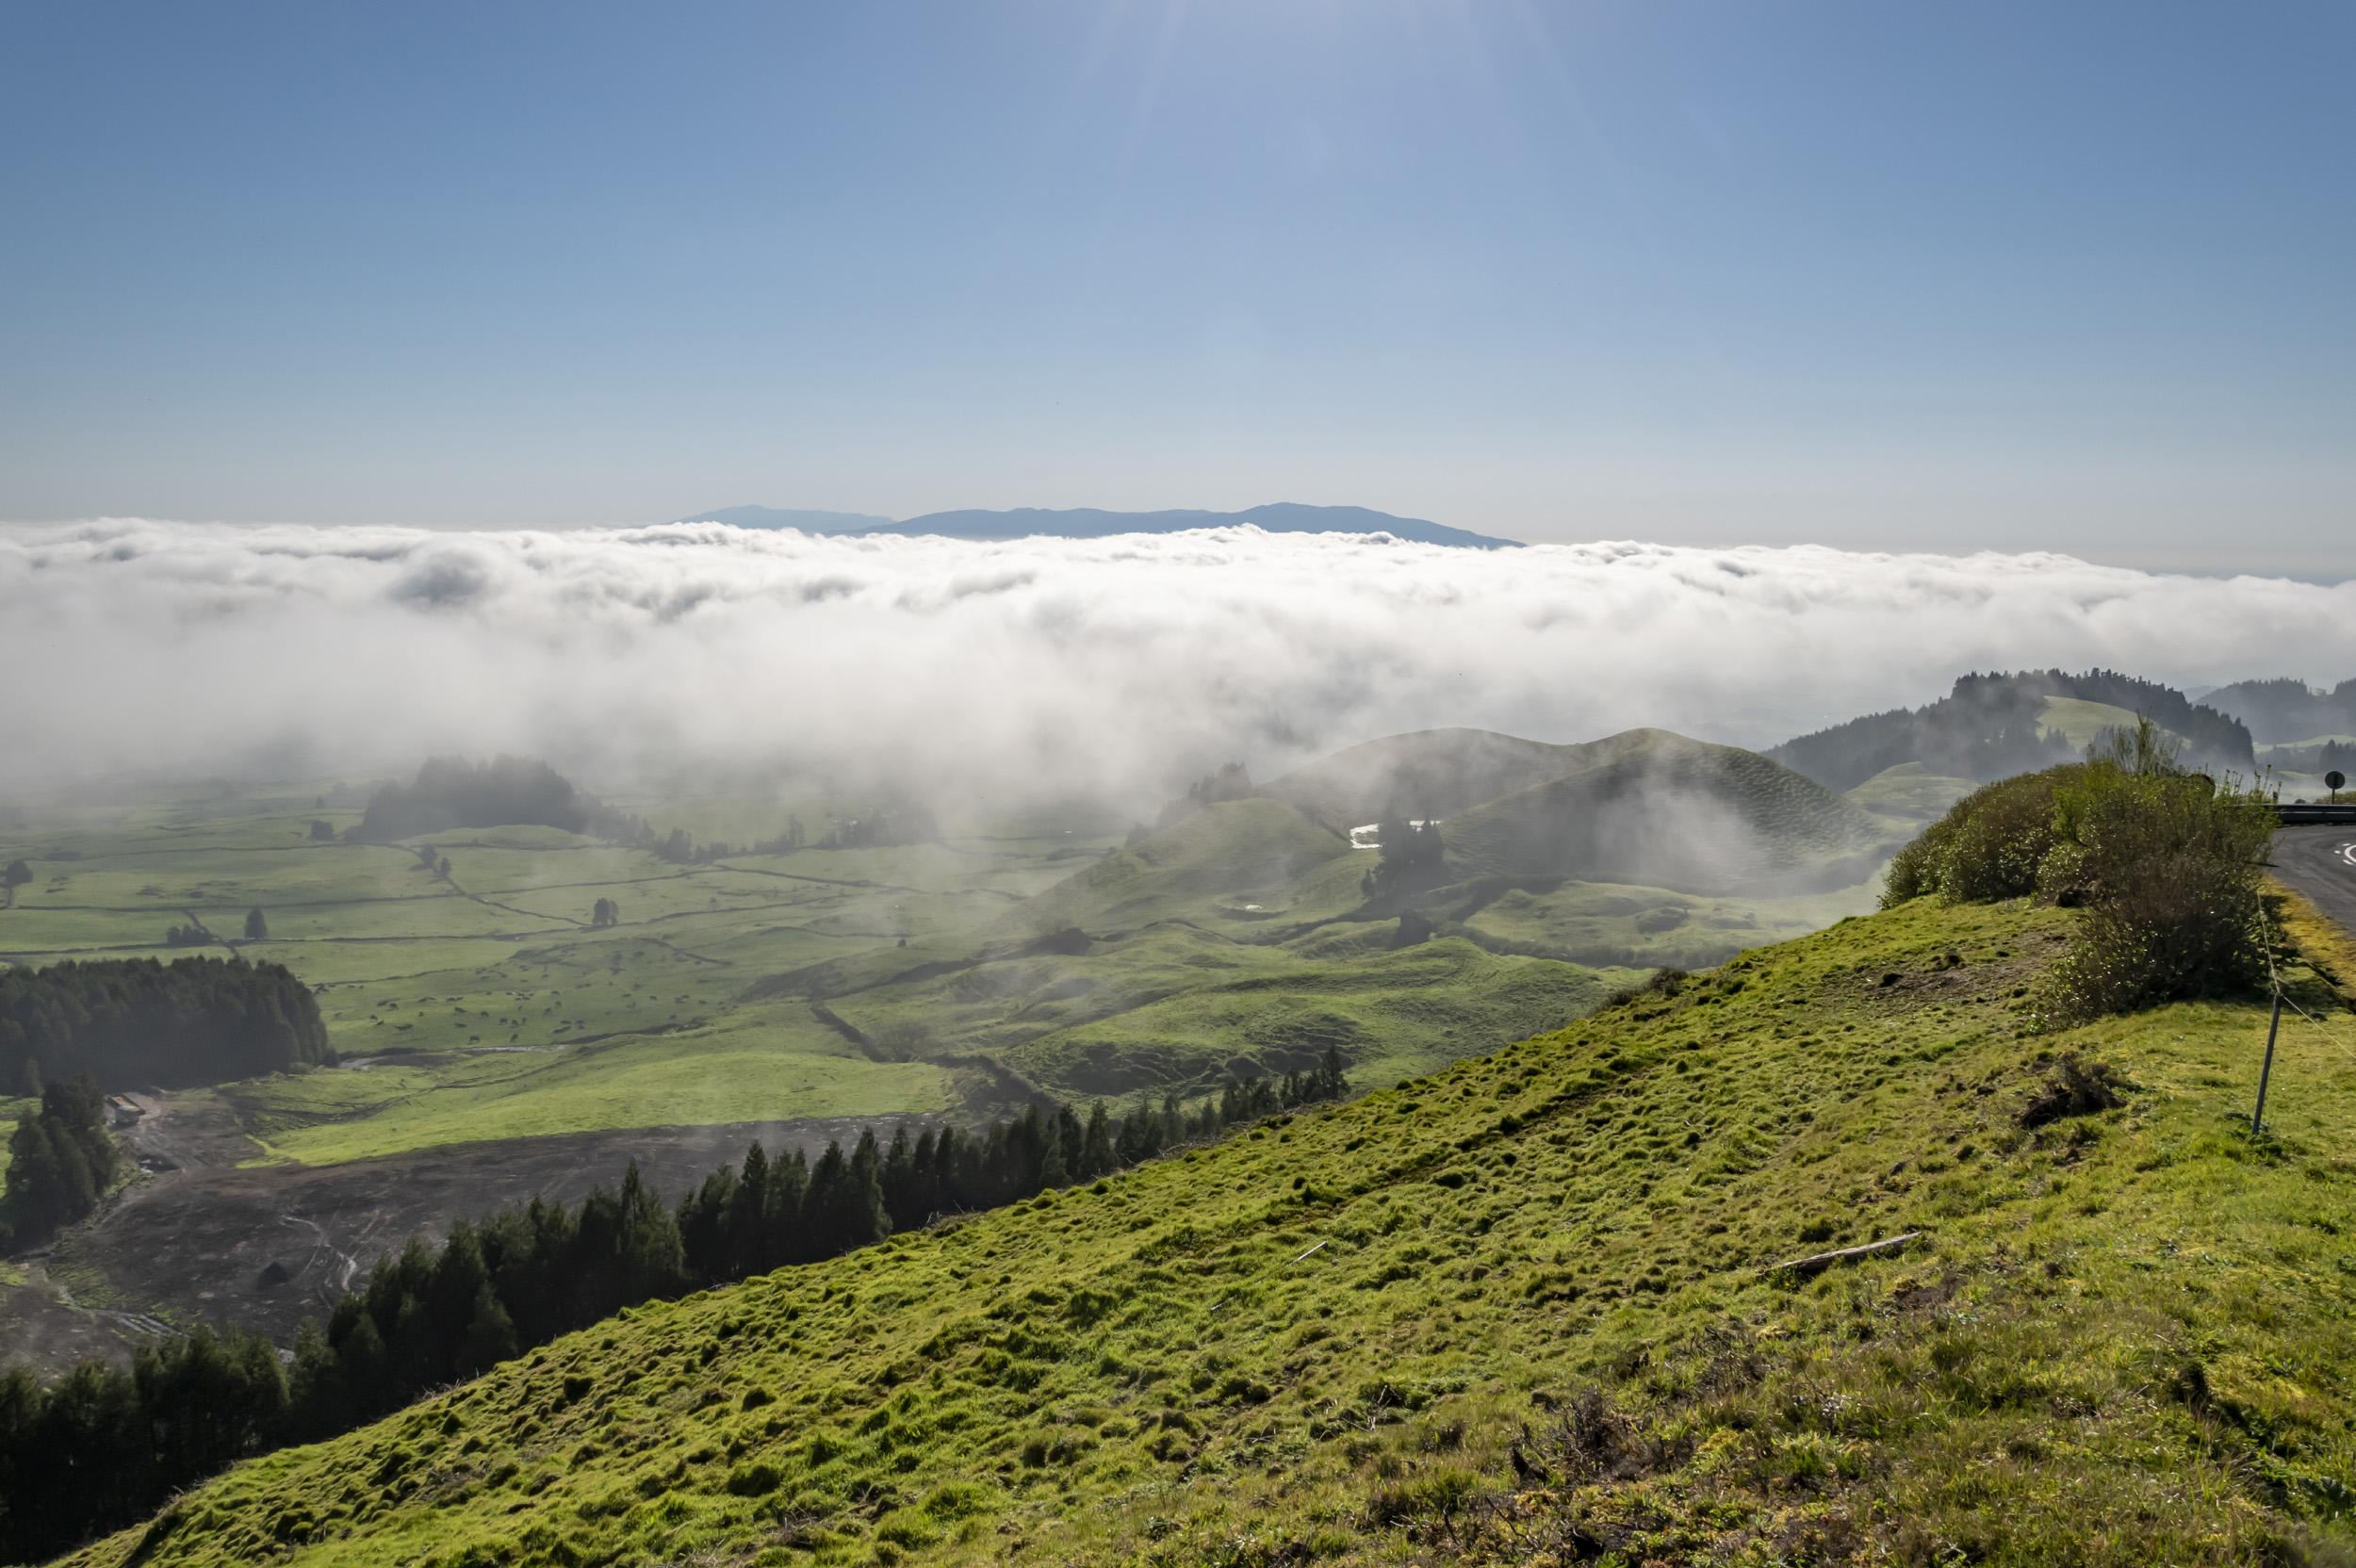 Morning Fog - Ponta Delgada, Portugal